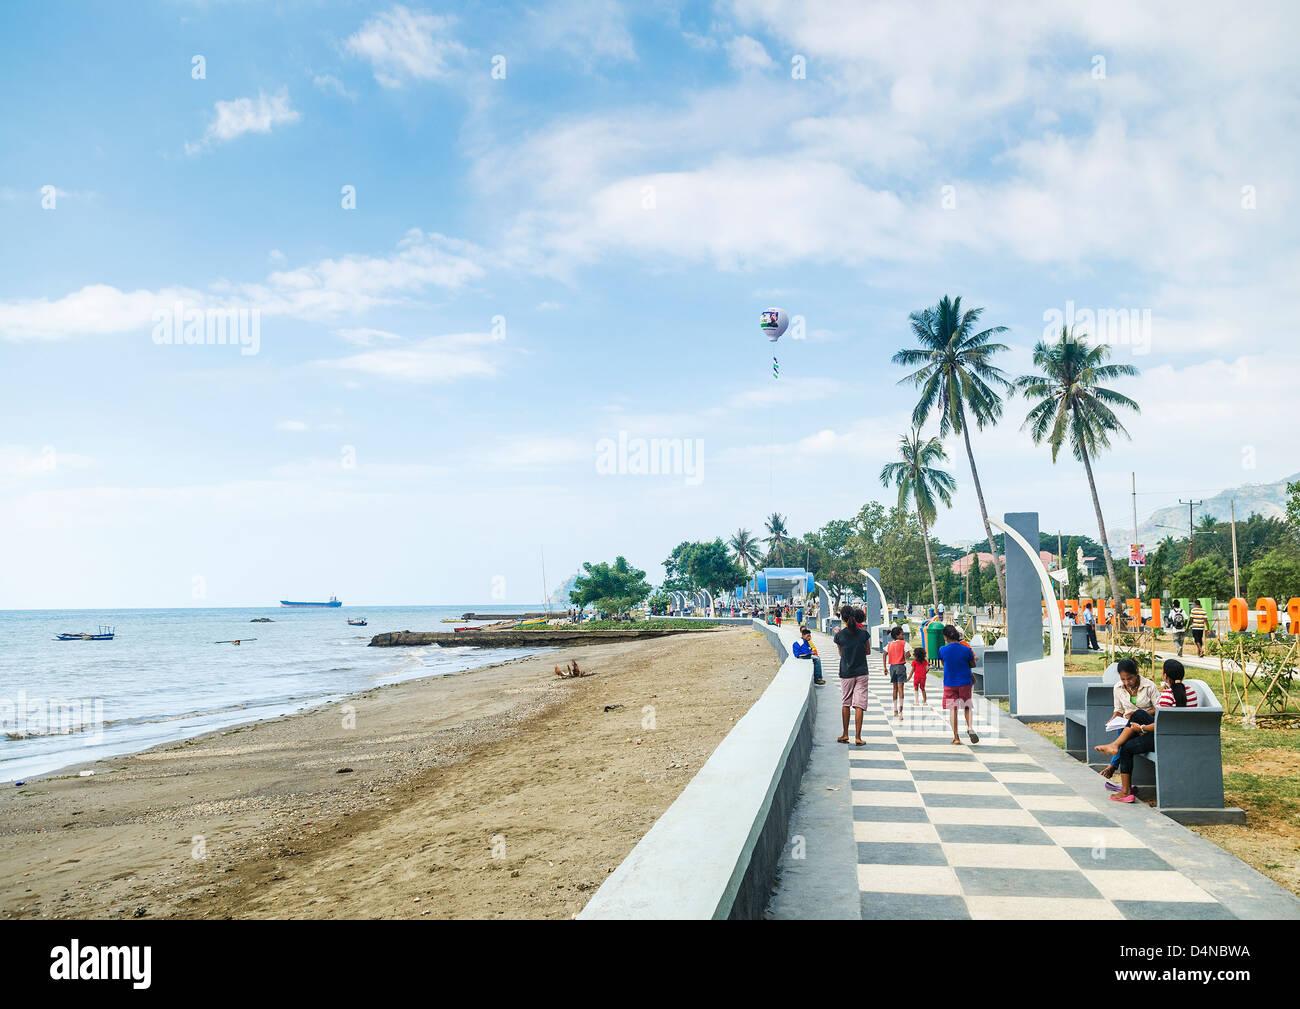 dili seaside promenade in east timor - Stock Image